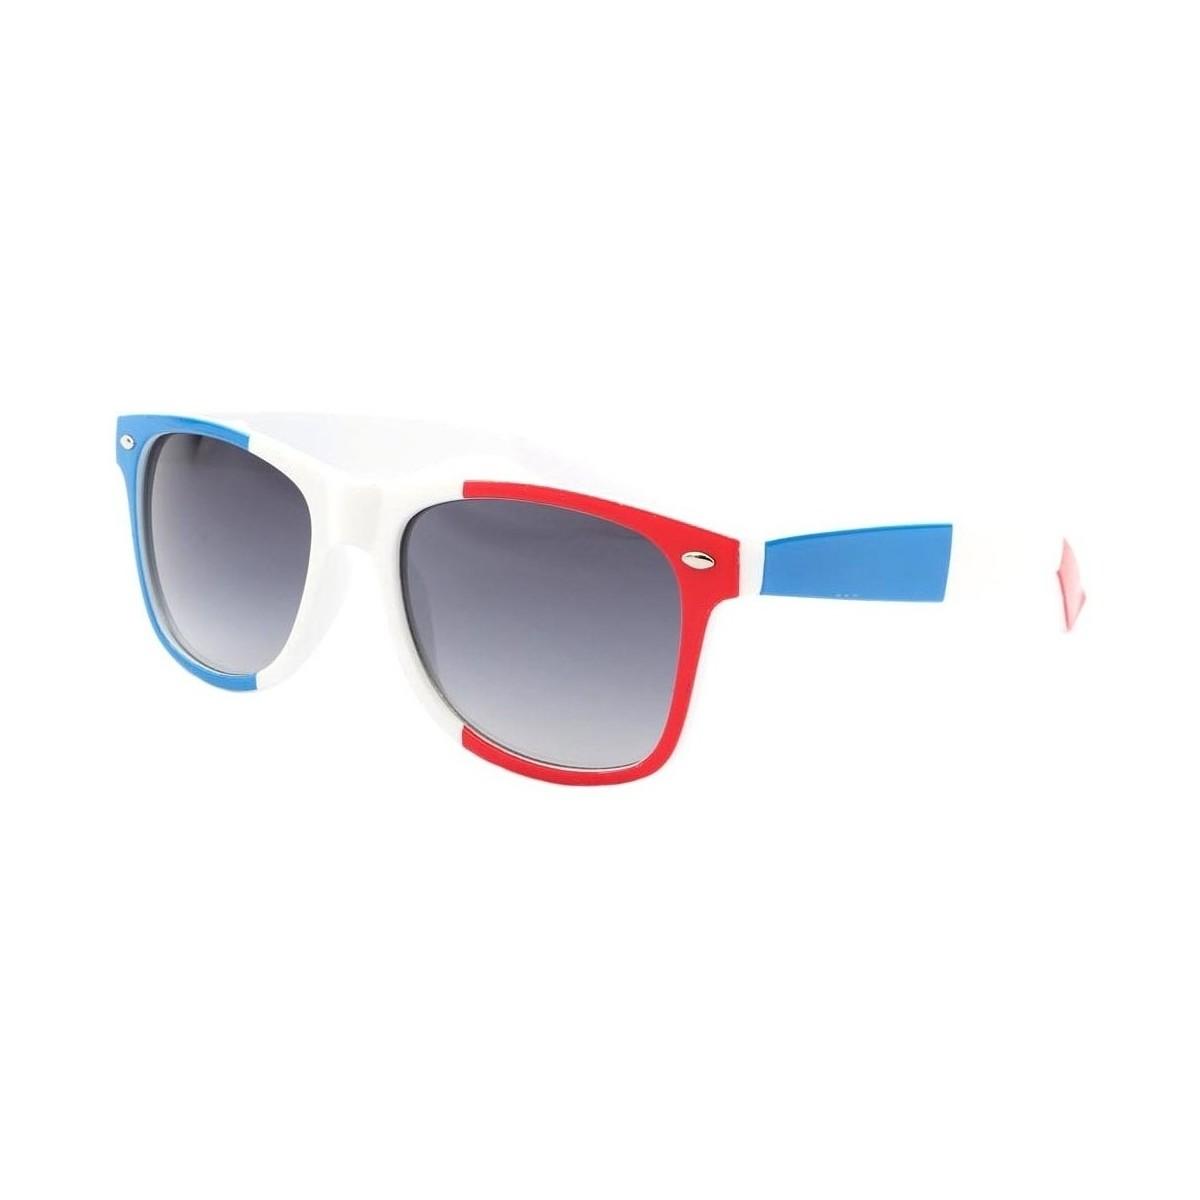 Eye Wear Lunettes de soleil France Bleu Blanc Rouge Bleu